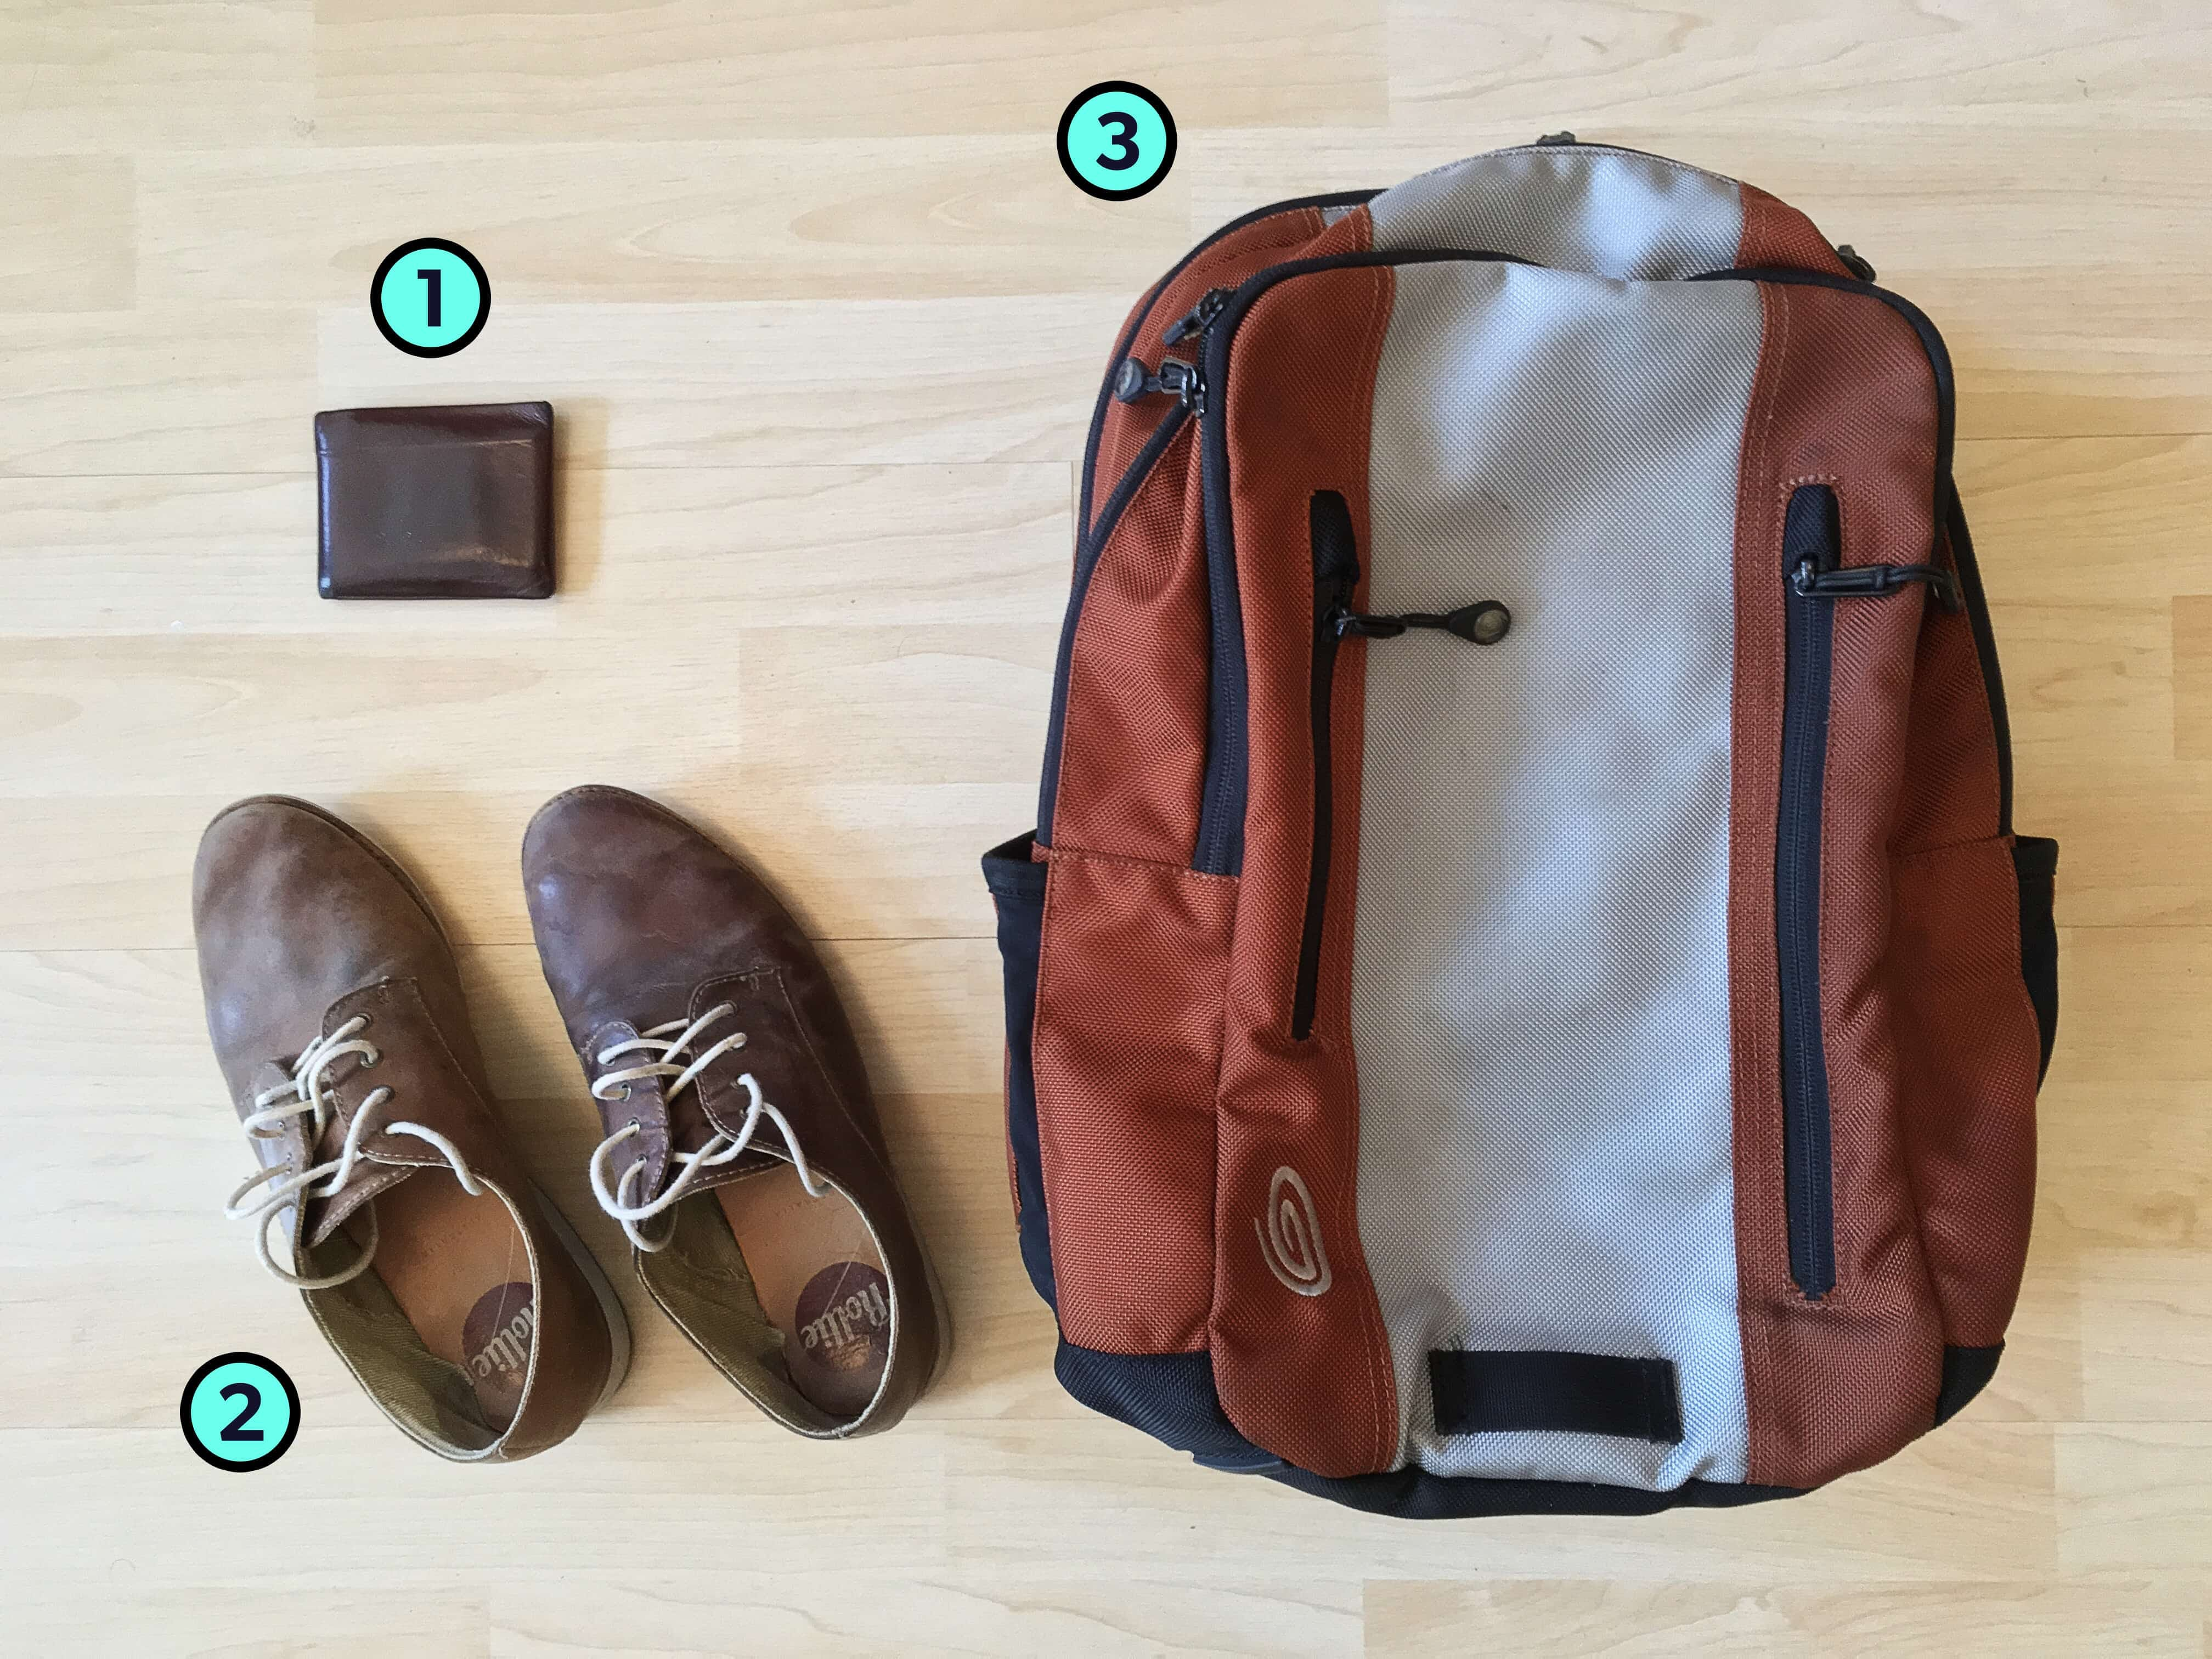 Sasha Tsimbler's Trusty Three Travel Items